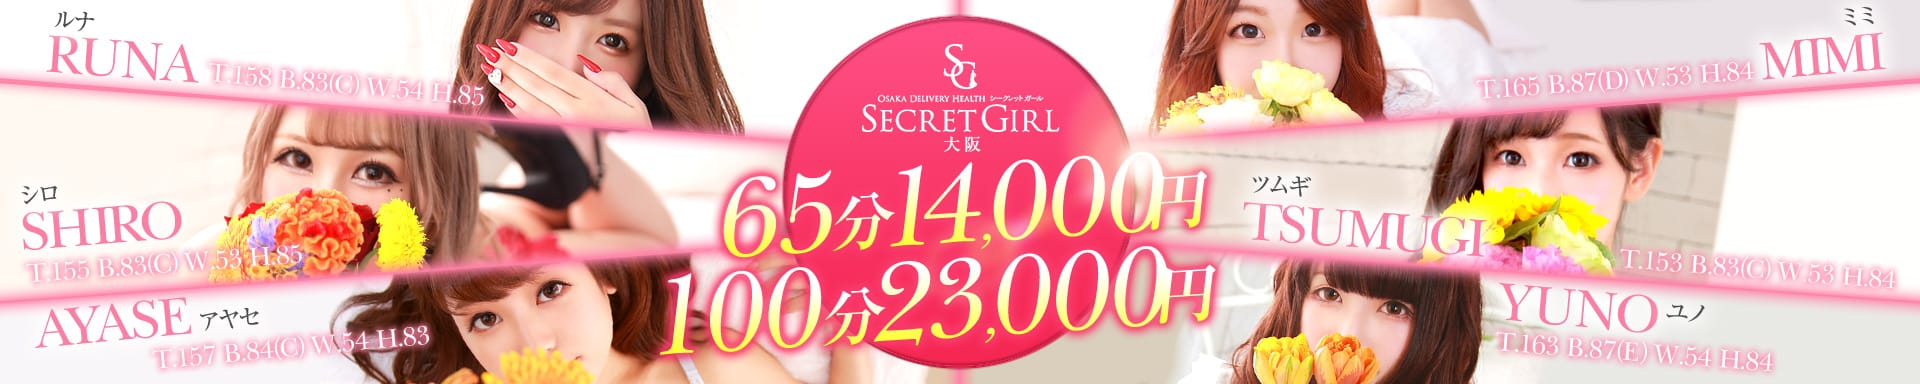 SecretGirls大阪店(シークレットガールズ大阪店) - 新大阪